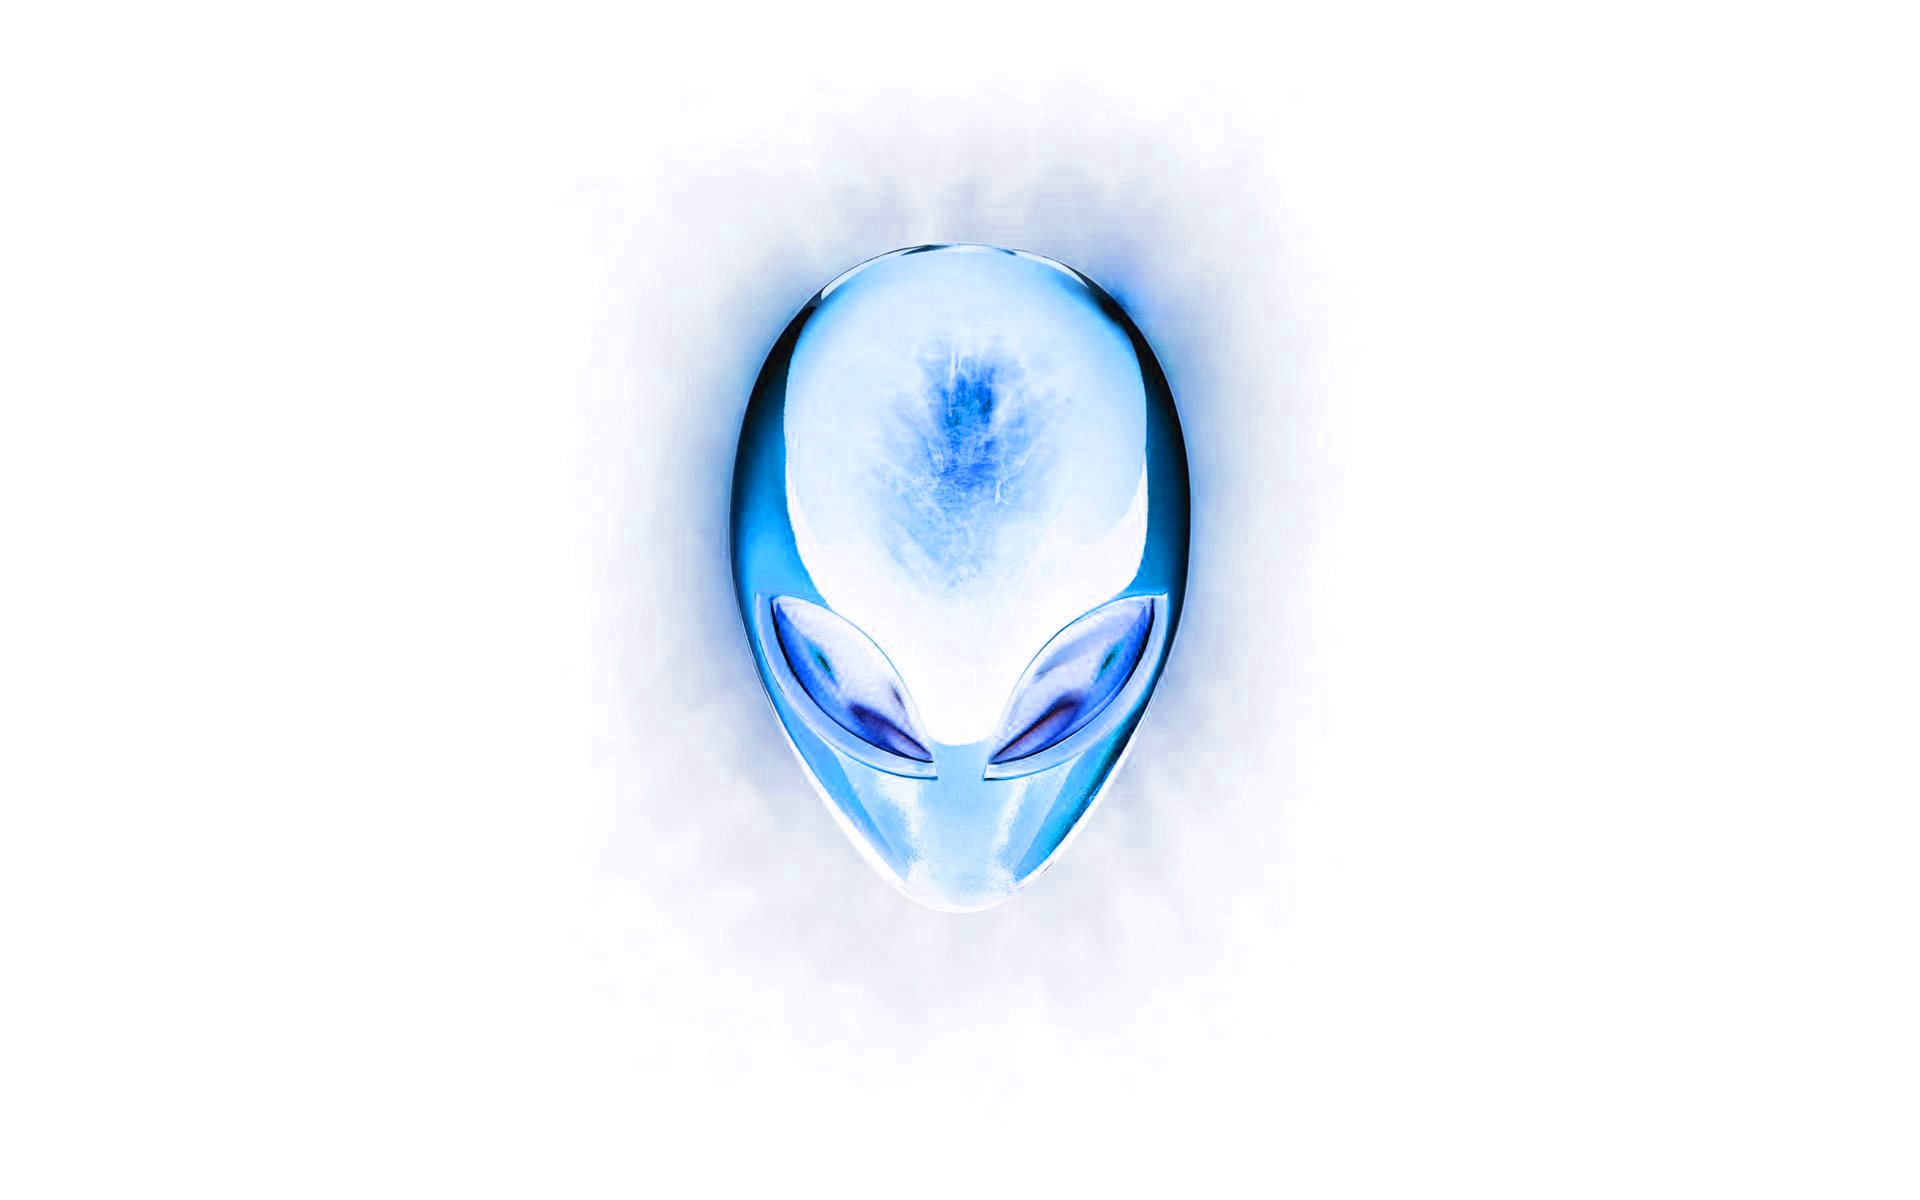 Alienware-Desktop-Background-White-And-Blue-Alien-Head-1920x1200